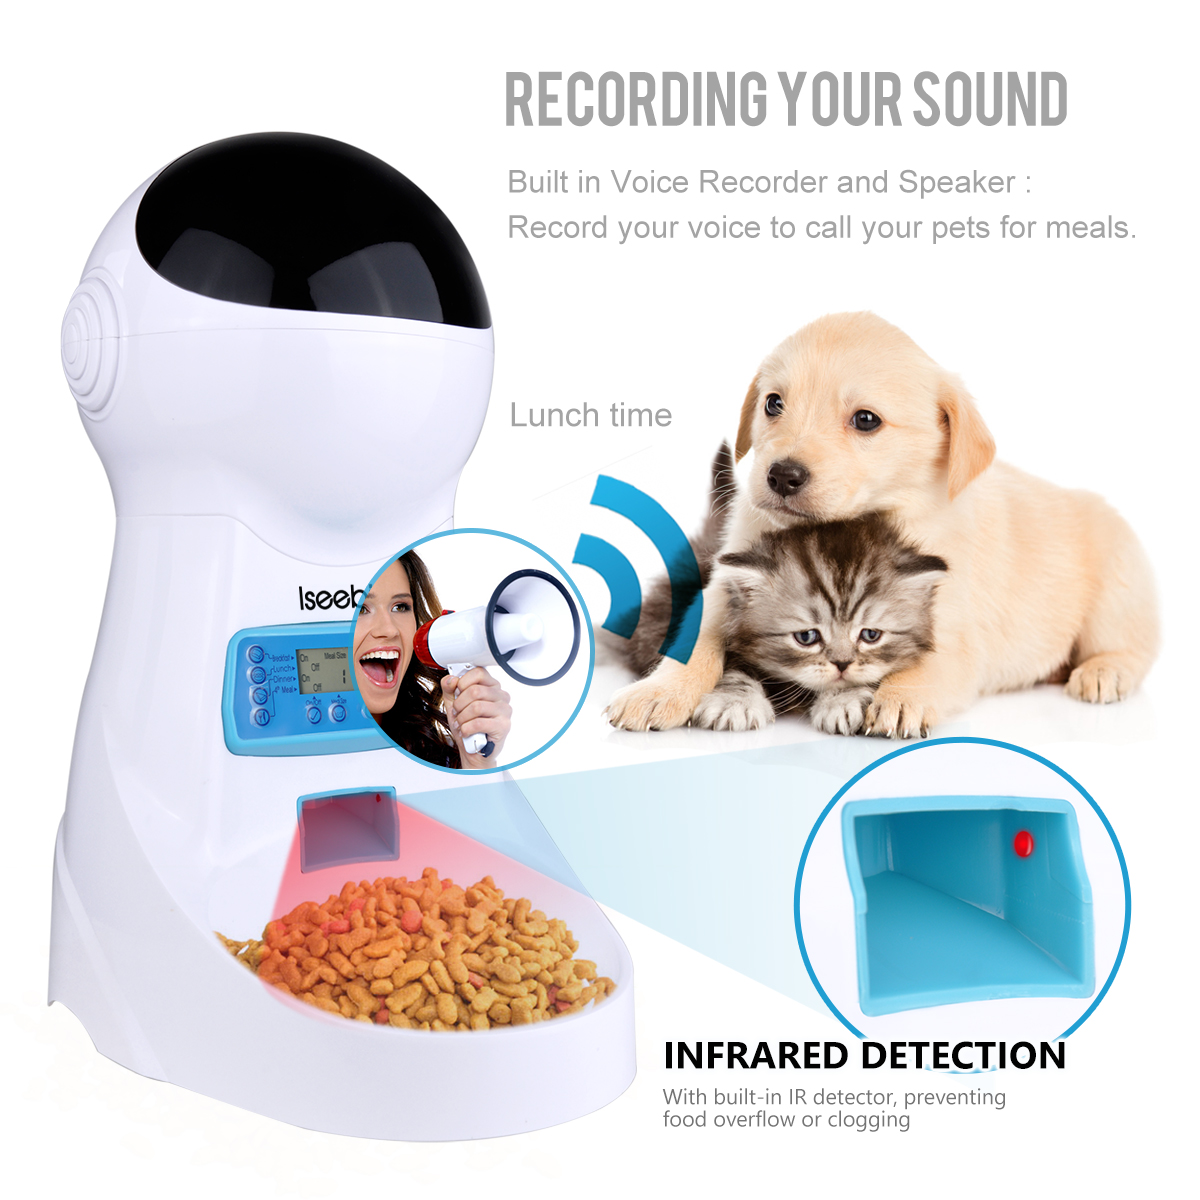 Iseebiz 3L Automatic Pet Feeder With Voice Record Pets food Bowl 11 » Pets Impress